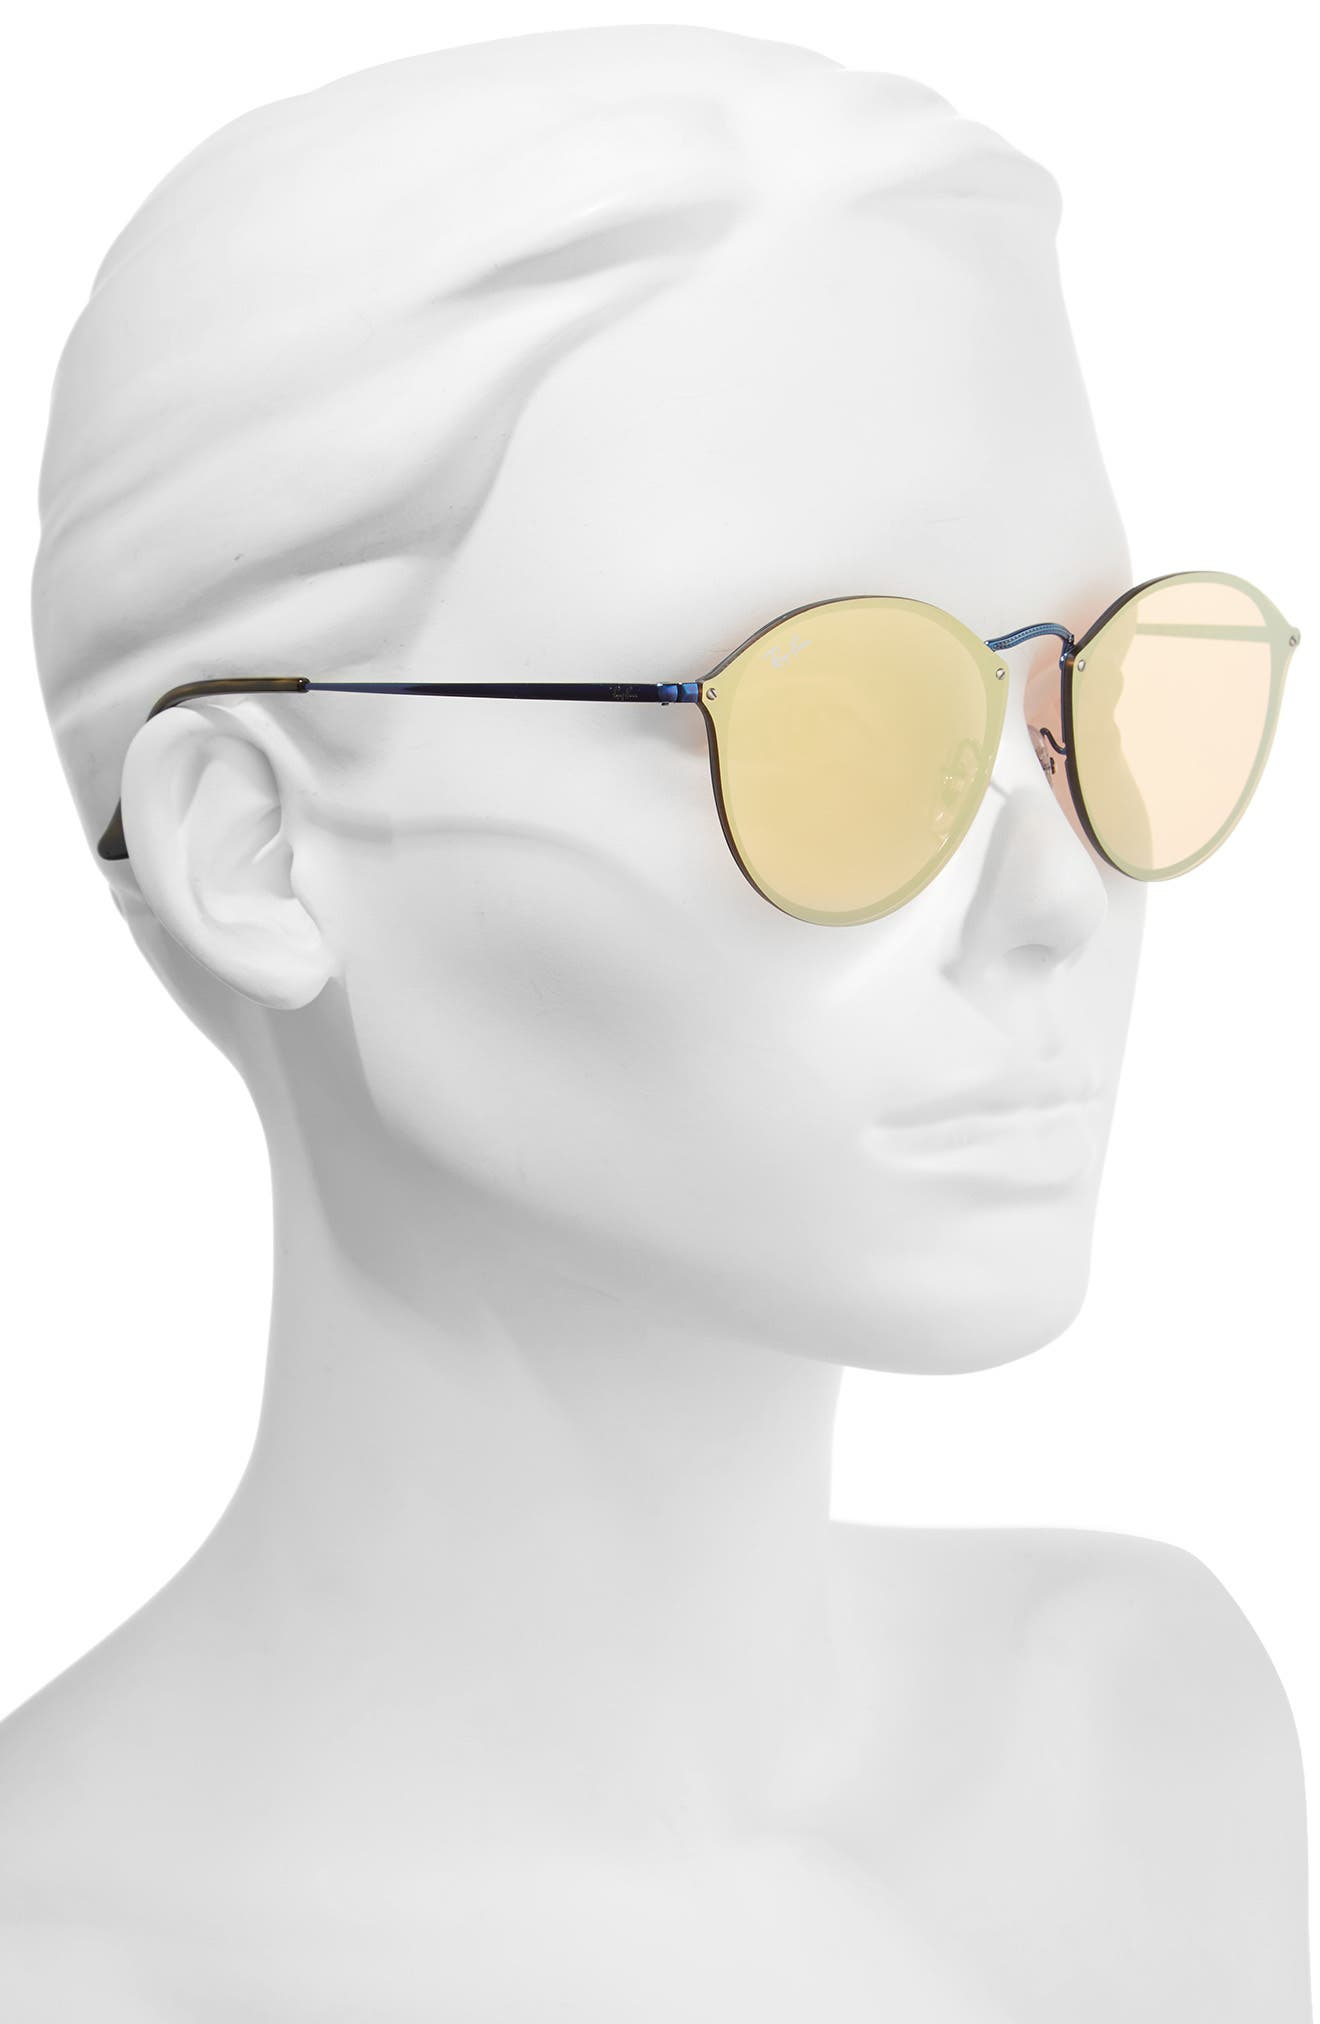 59mm Blaze Round Mirrored Sunglasses,                             Alternate thumbnail 7, color,